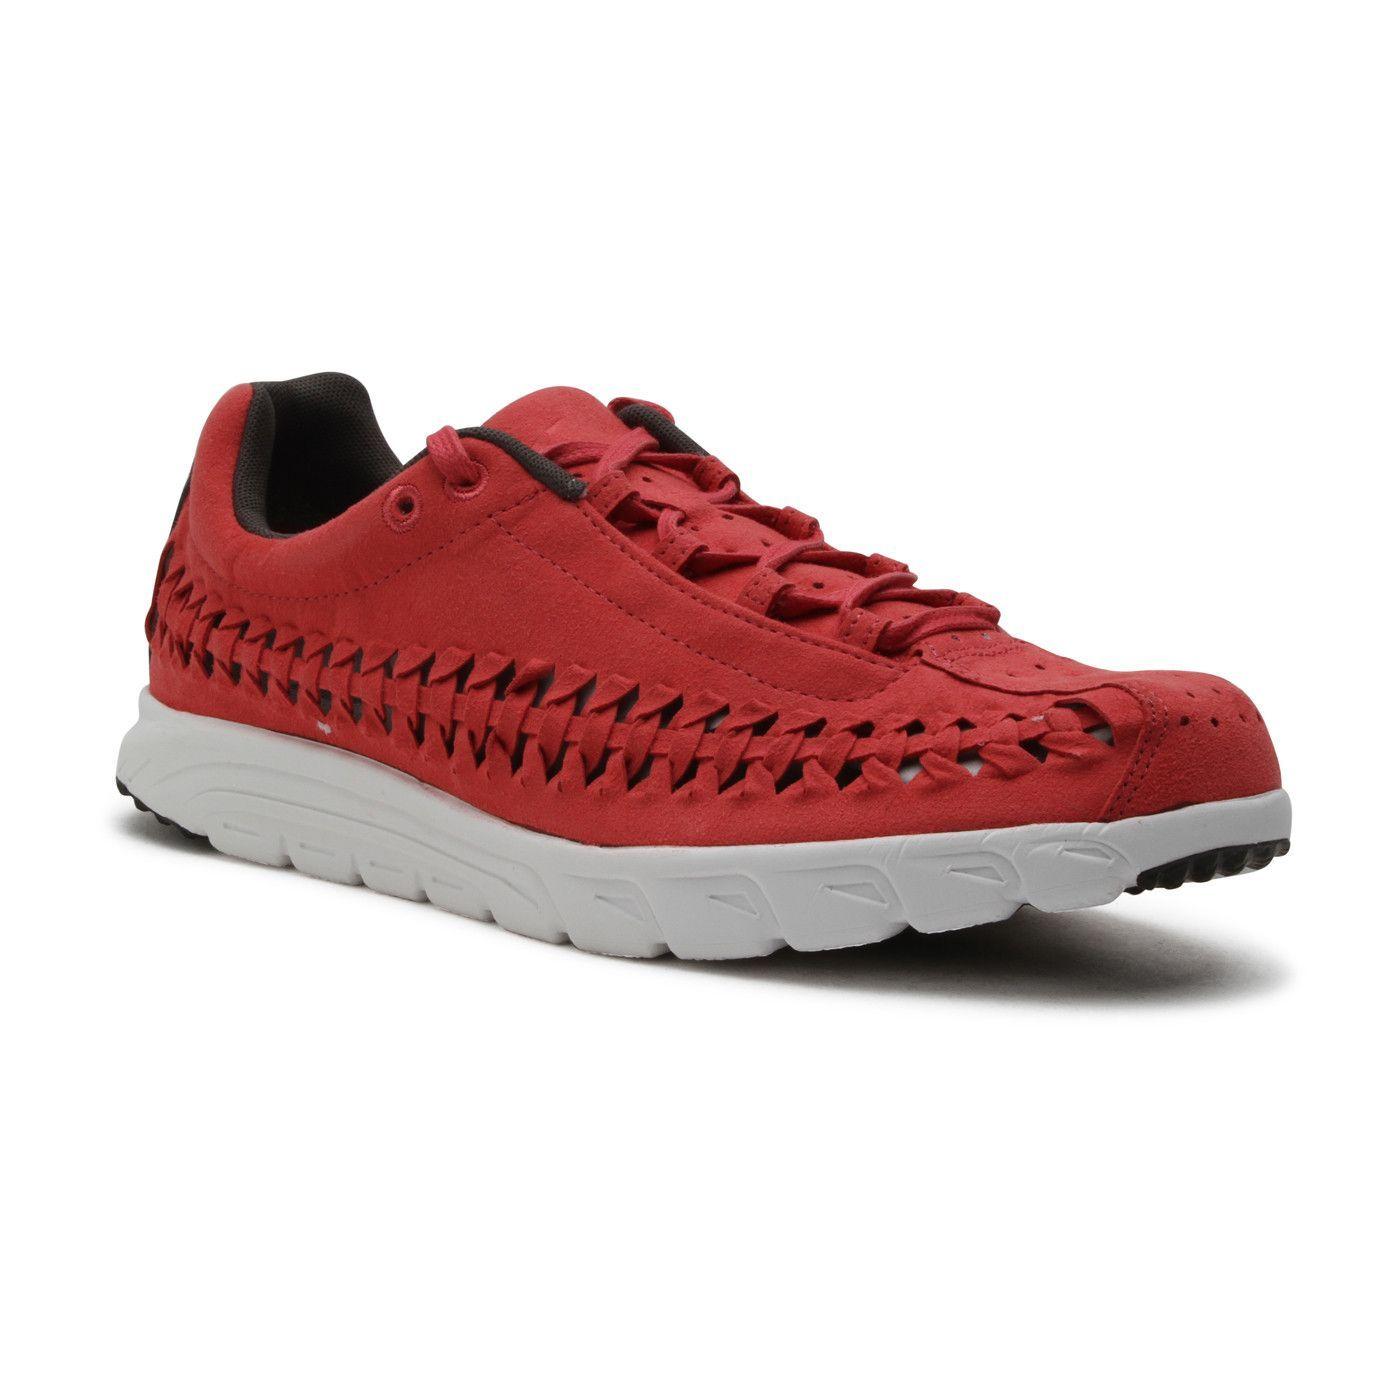 buy online 2943f a813c Nike Mayfly Woven - 833132-600   Nike Mayfly Woven   Nike, Mayfly ve ...